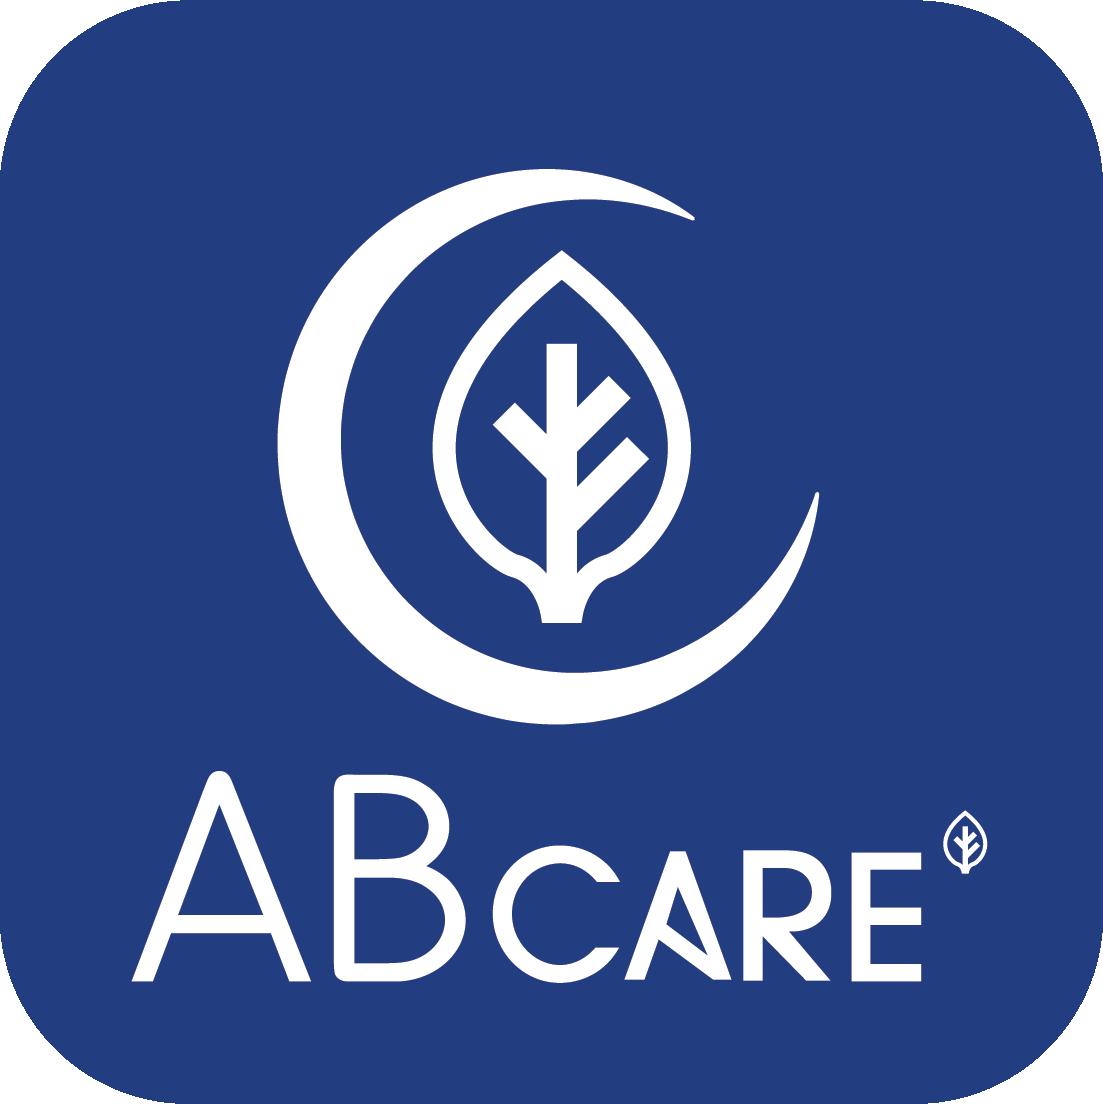 ABcare